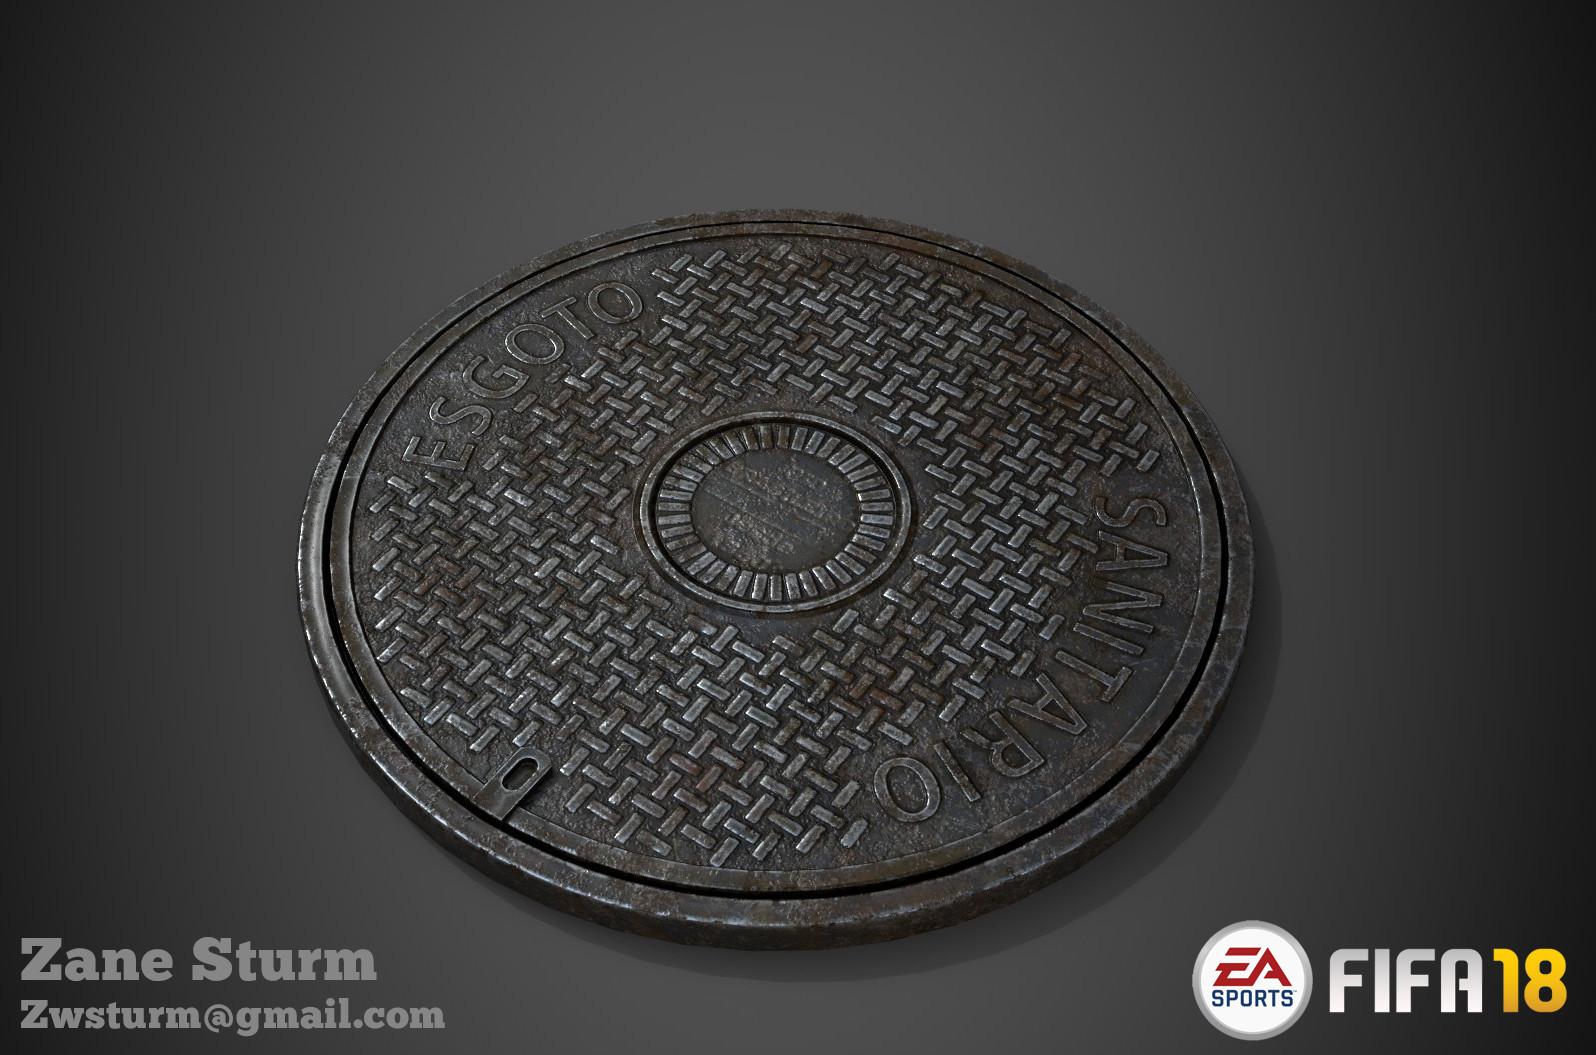 Zane sturm manhole round